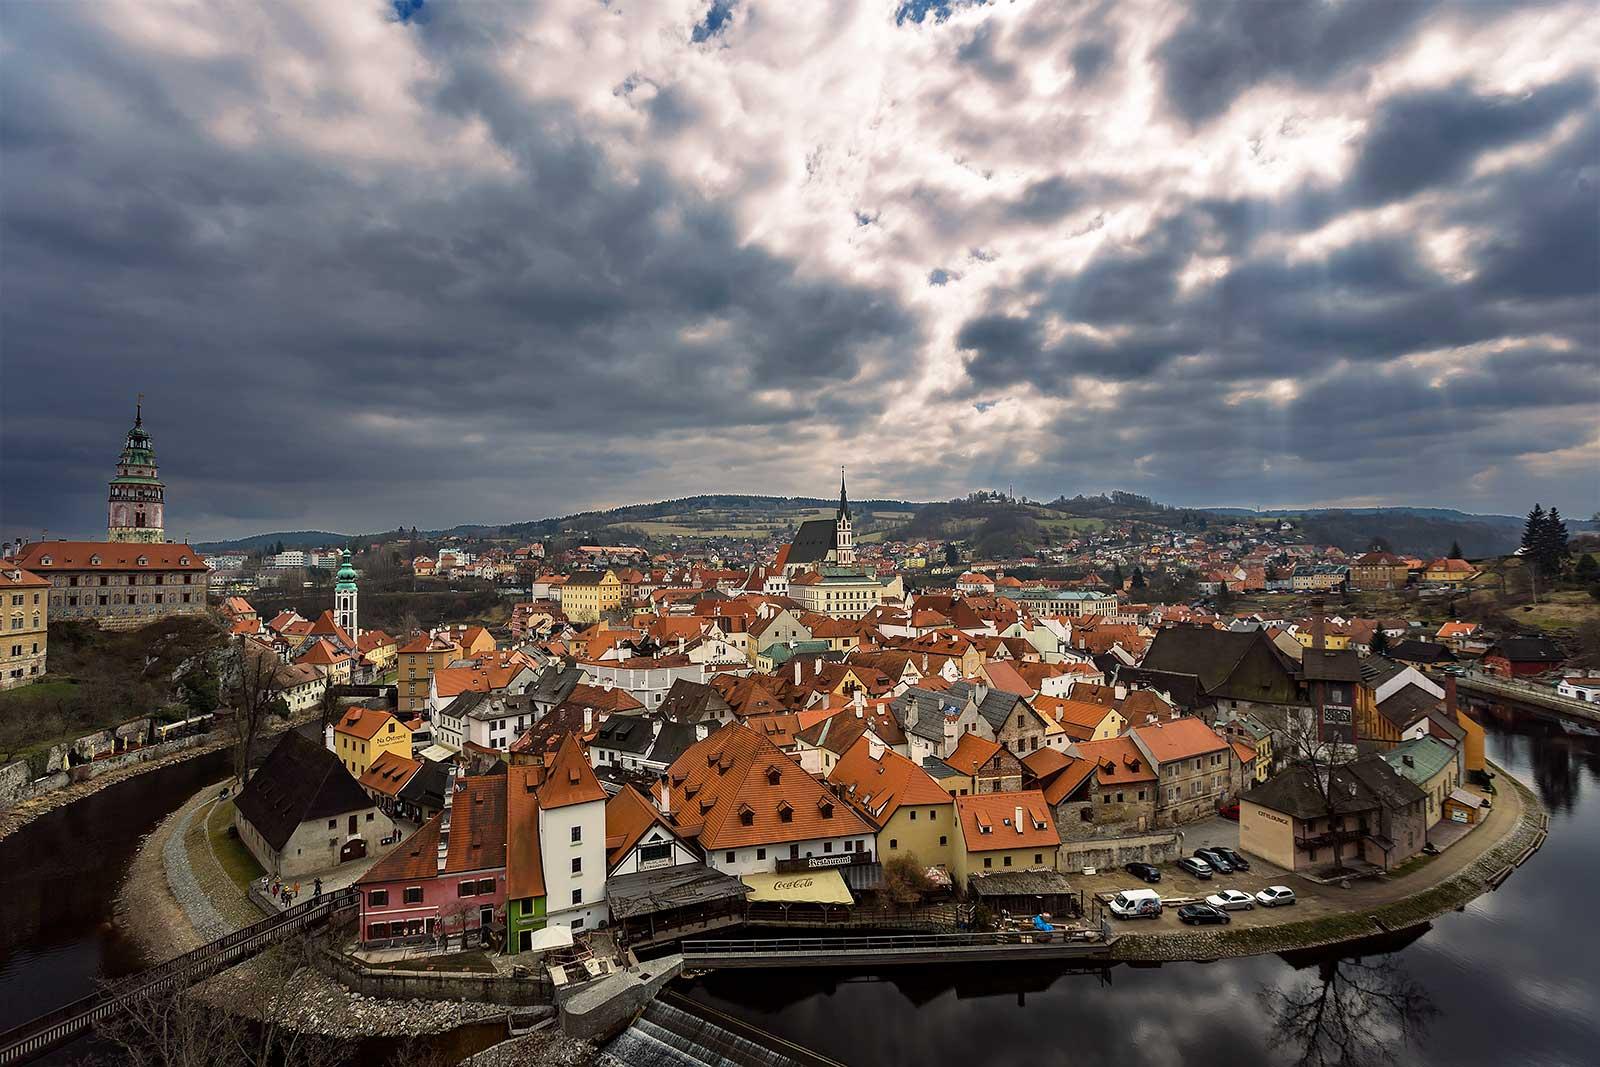 cesky-krumlov-view-czech-republic-1